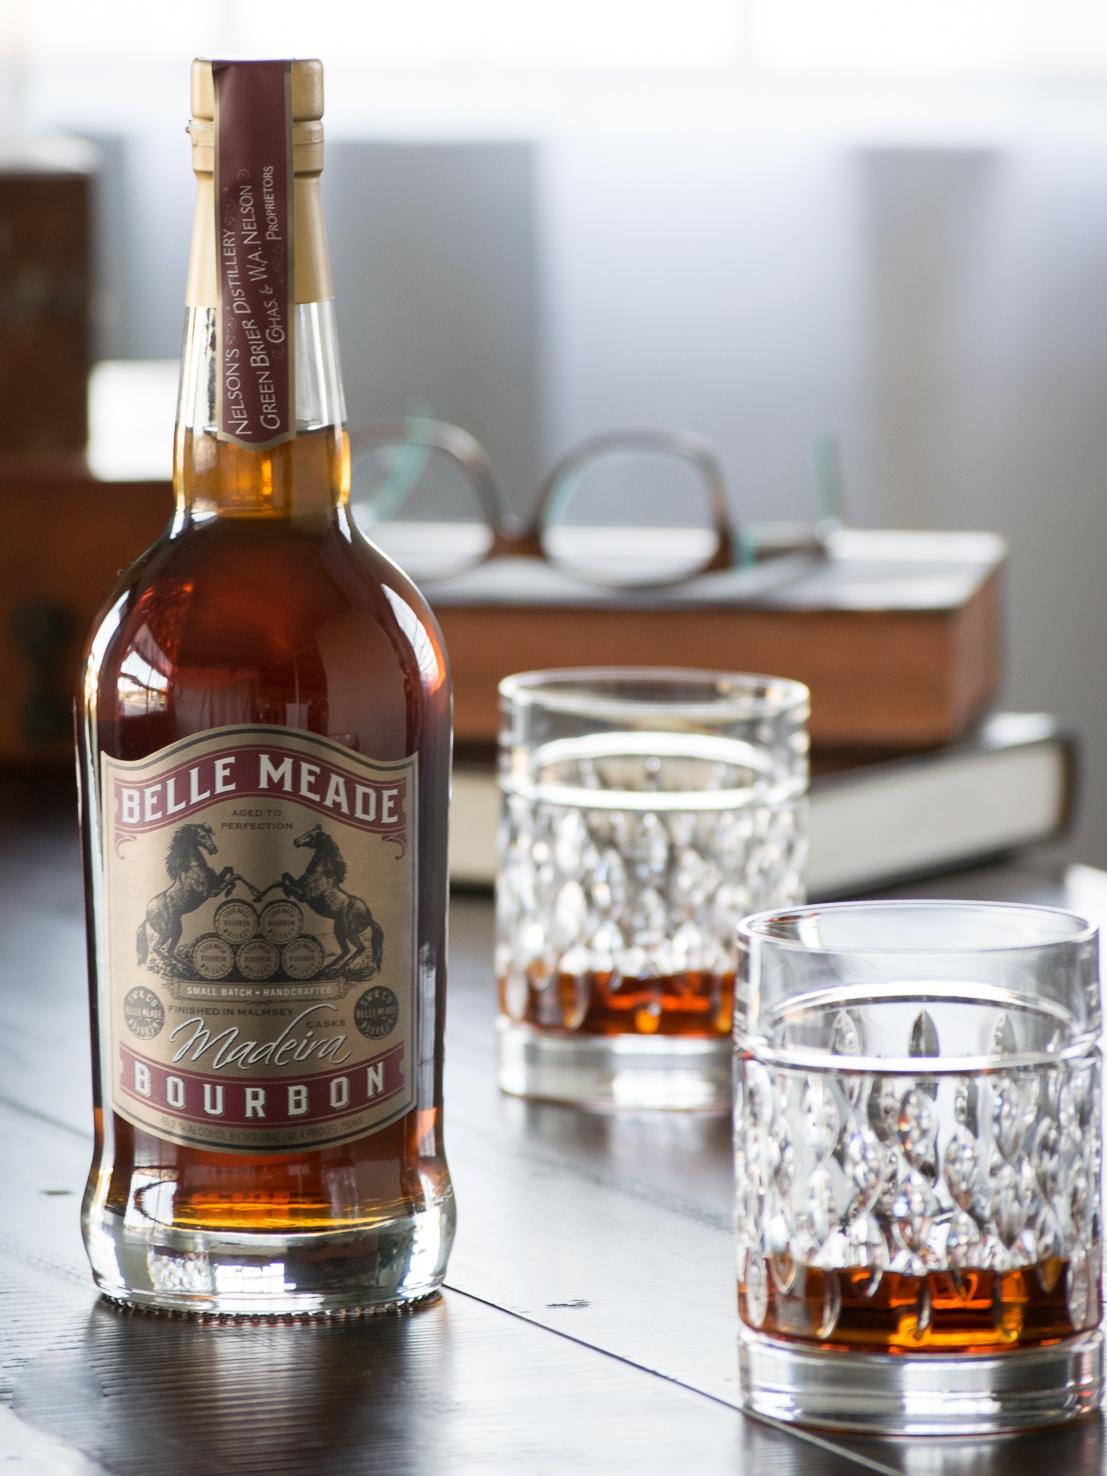 Cognac Cask Finished Belle Meade Bourbon